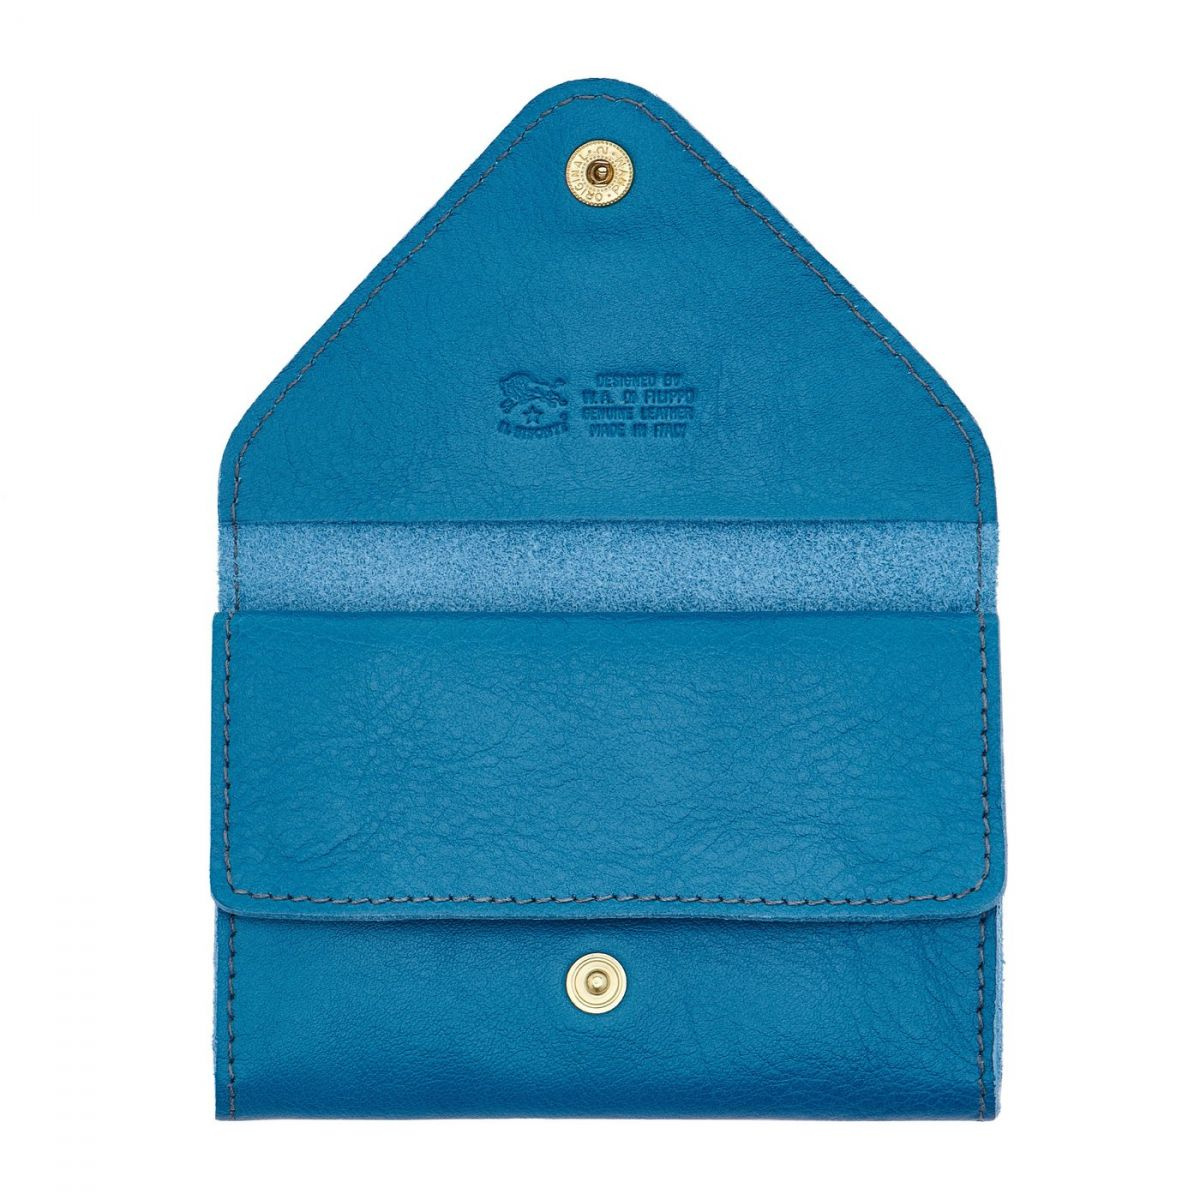 Card Case in Cowhide Leather color Blue Teal - Uffizi line SCC039   Details